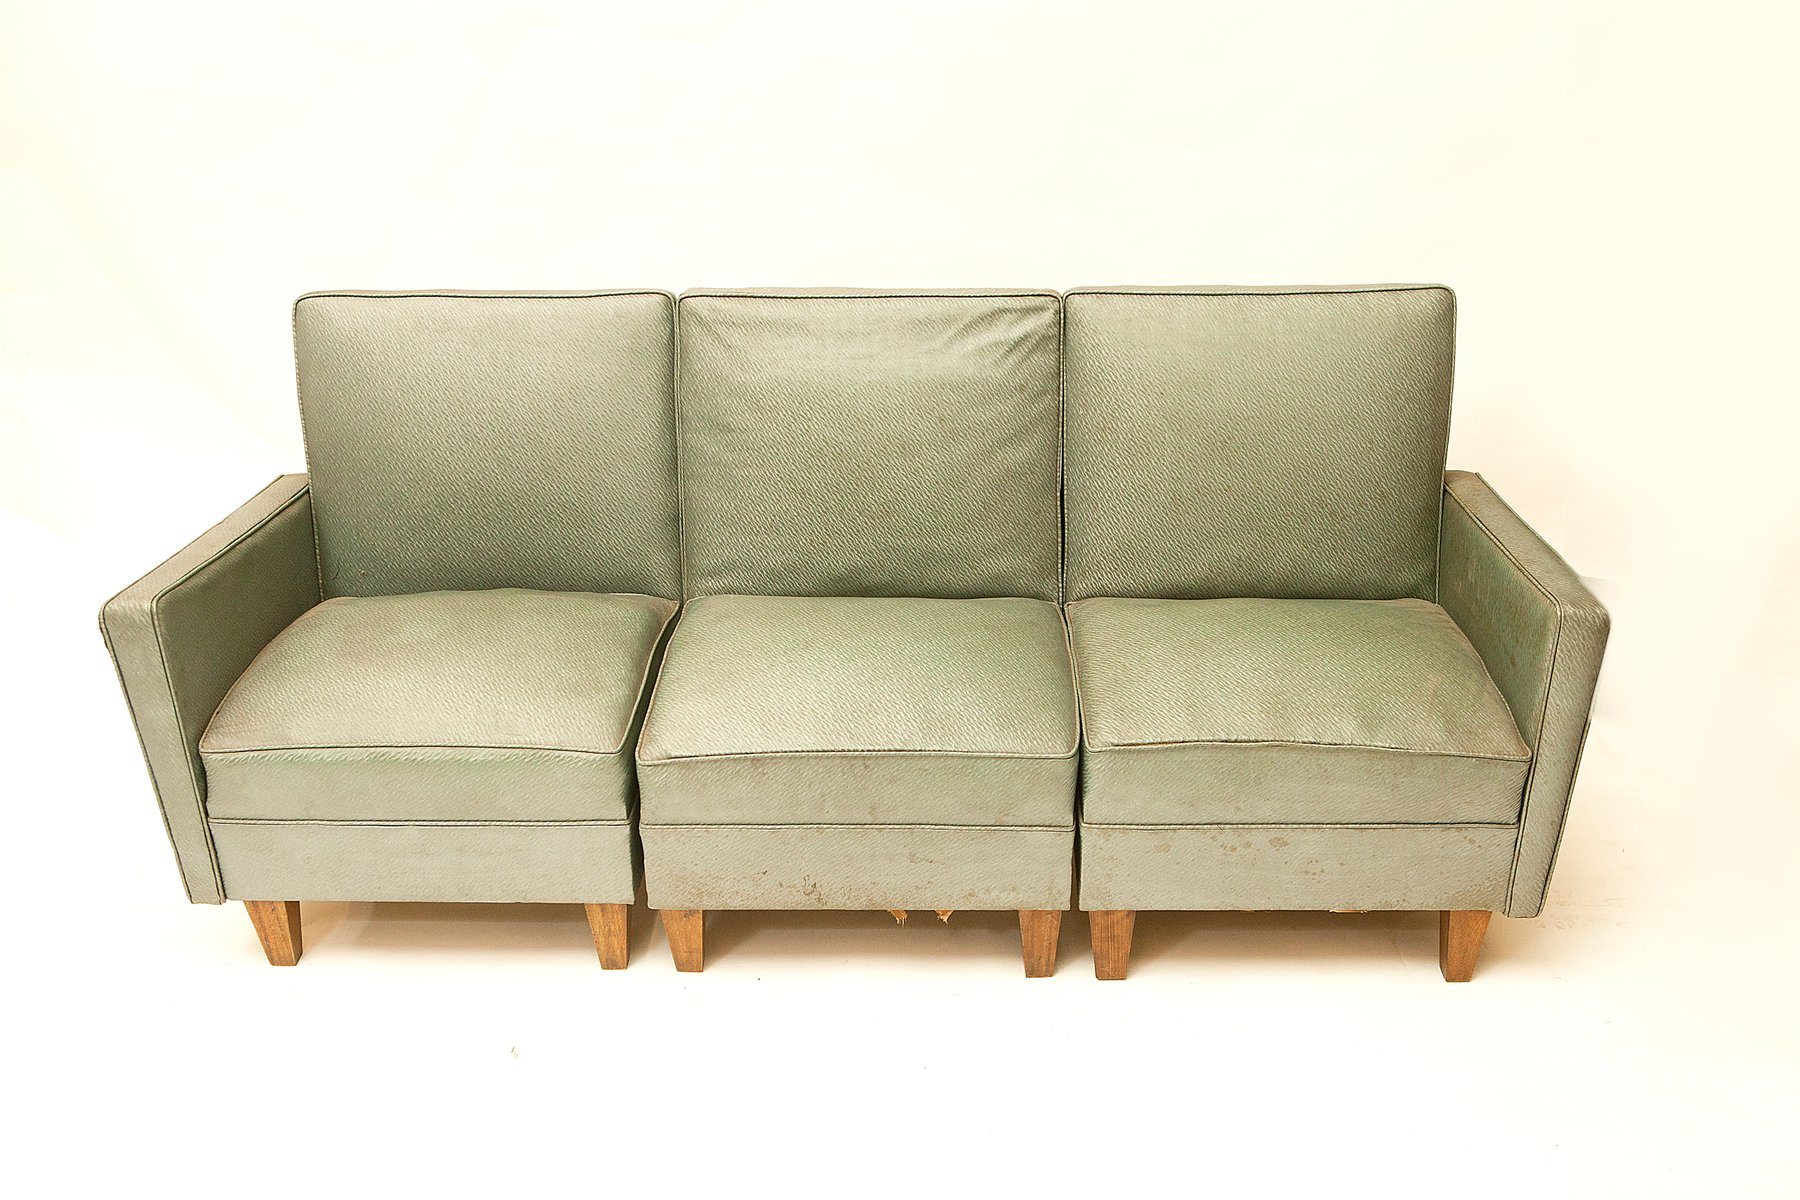 modulares sofa von joaquim tenreiro 1950er bei pamono kaufen. Black Bedroom Furniture Sets. Home Design Ideas